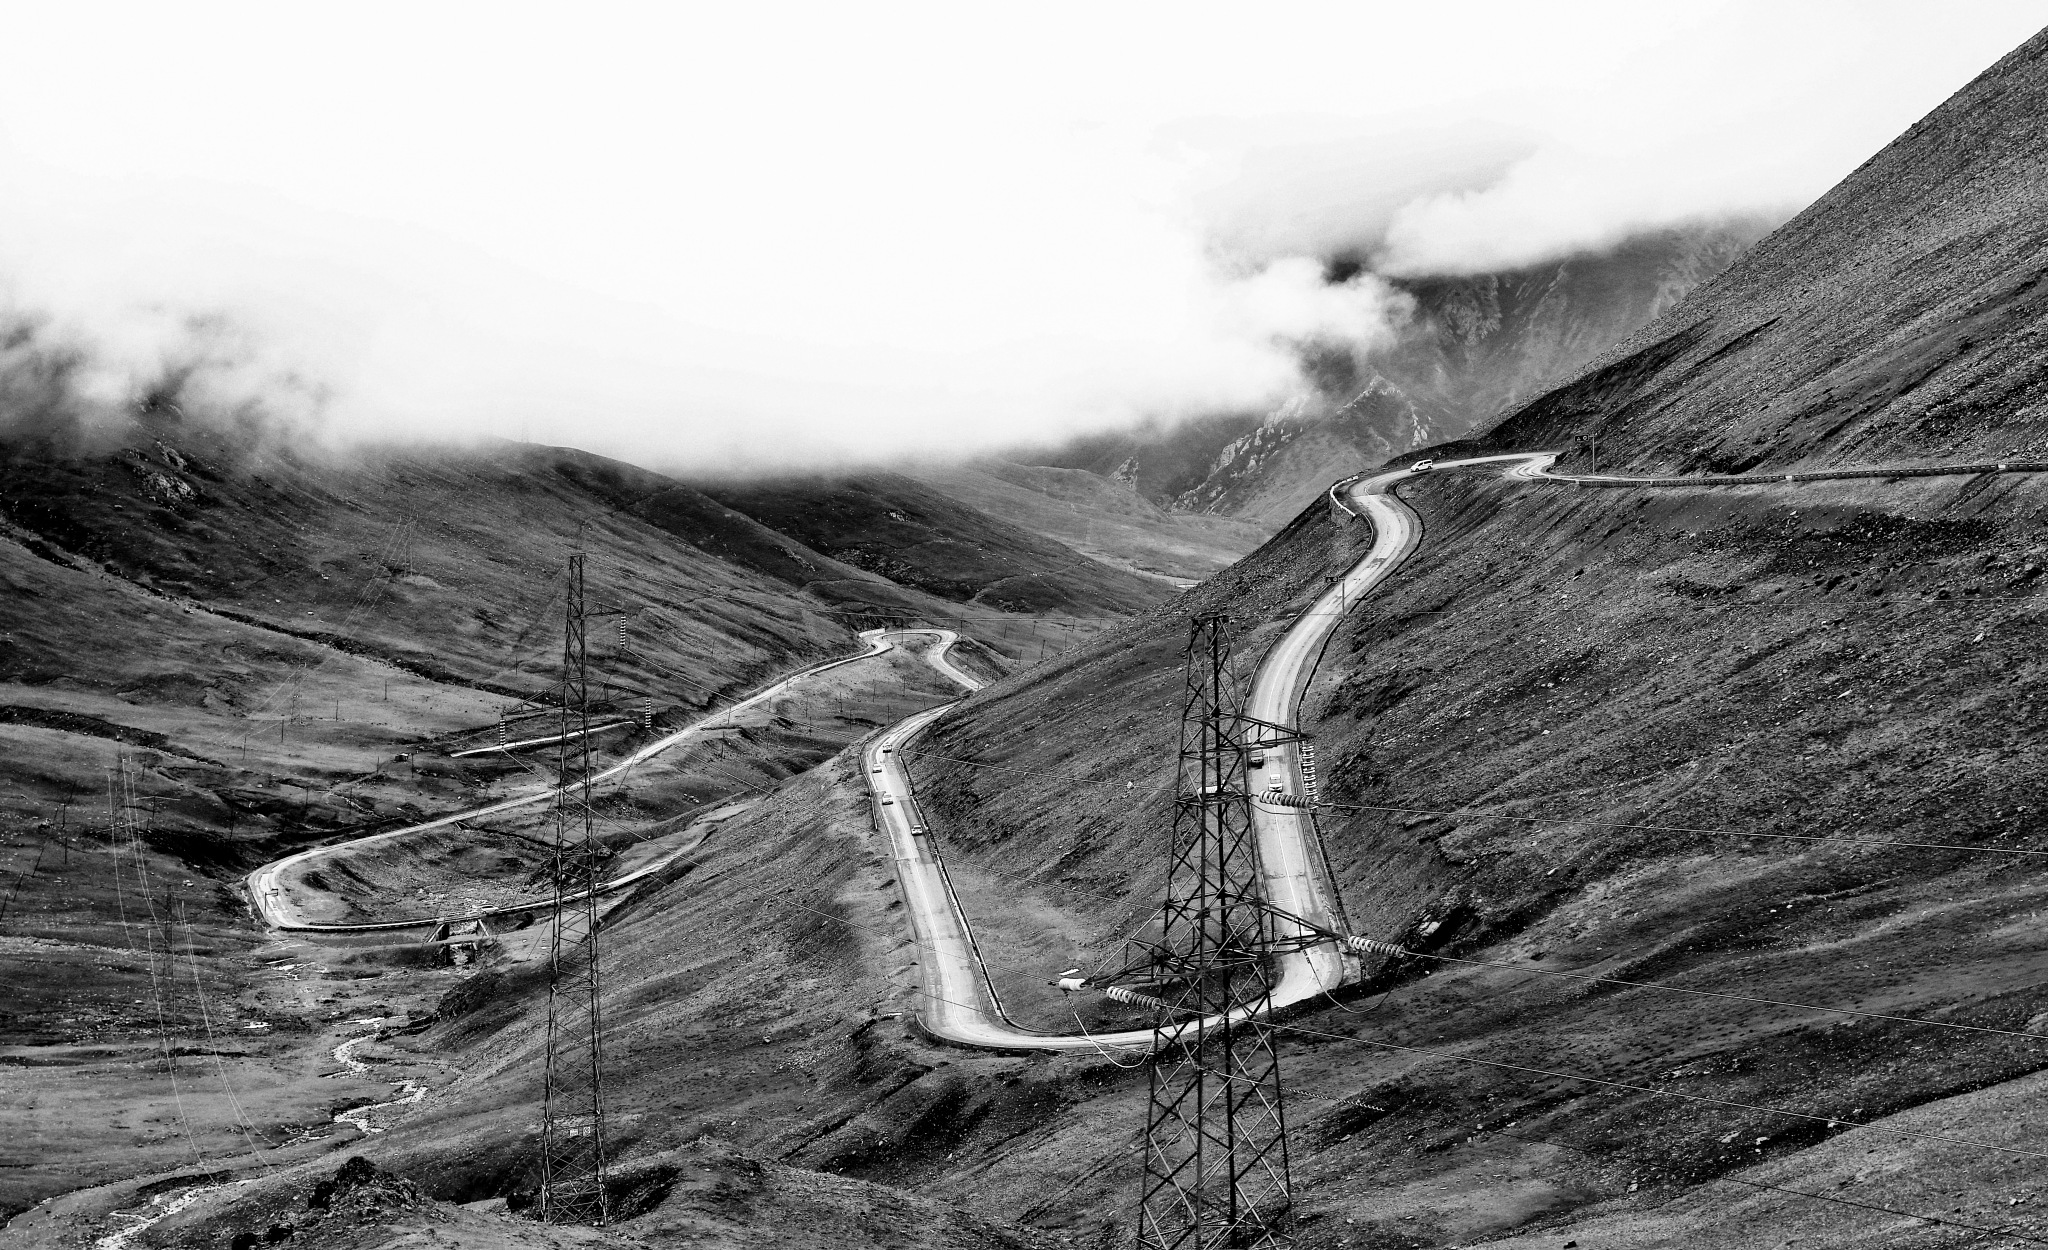 Mountain road by leecj0129